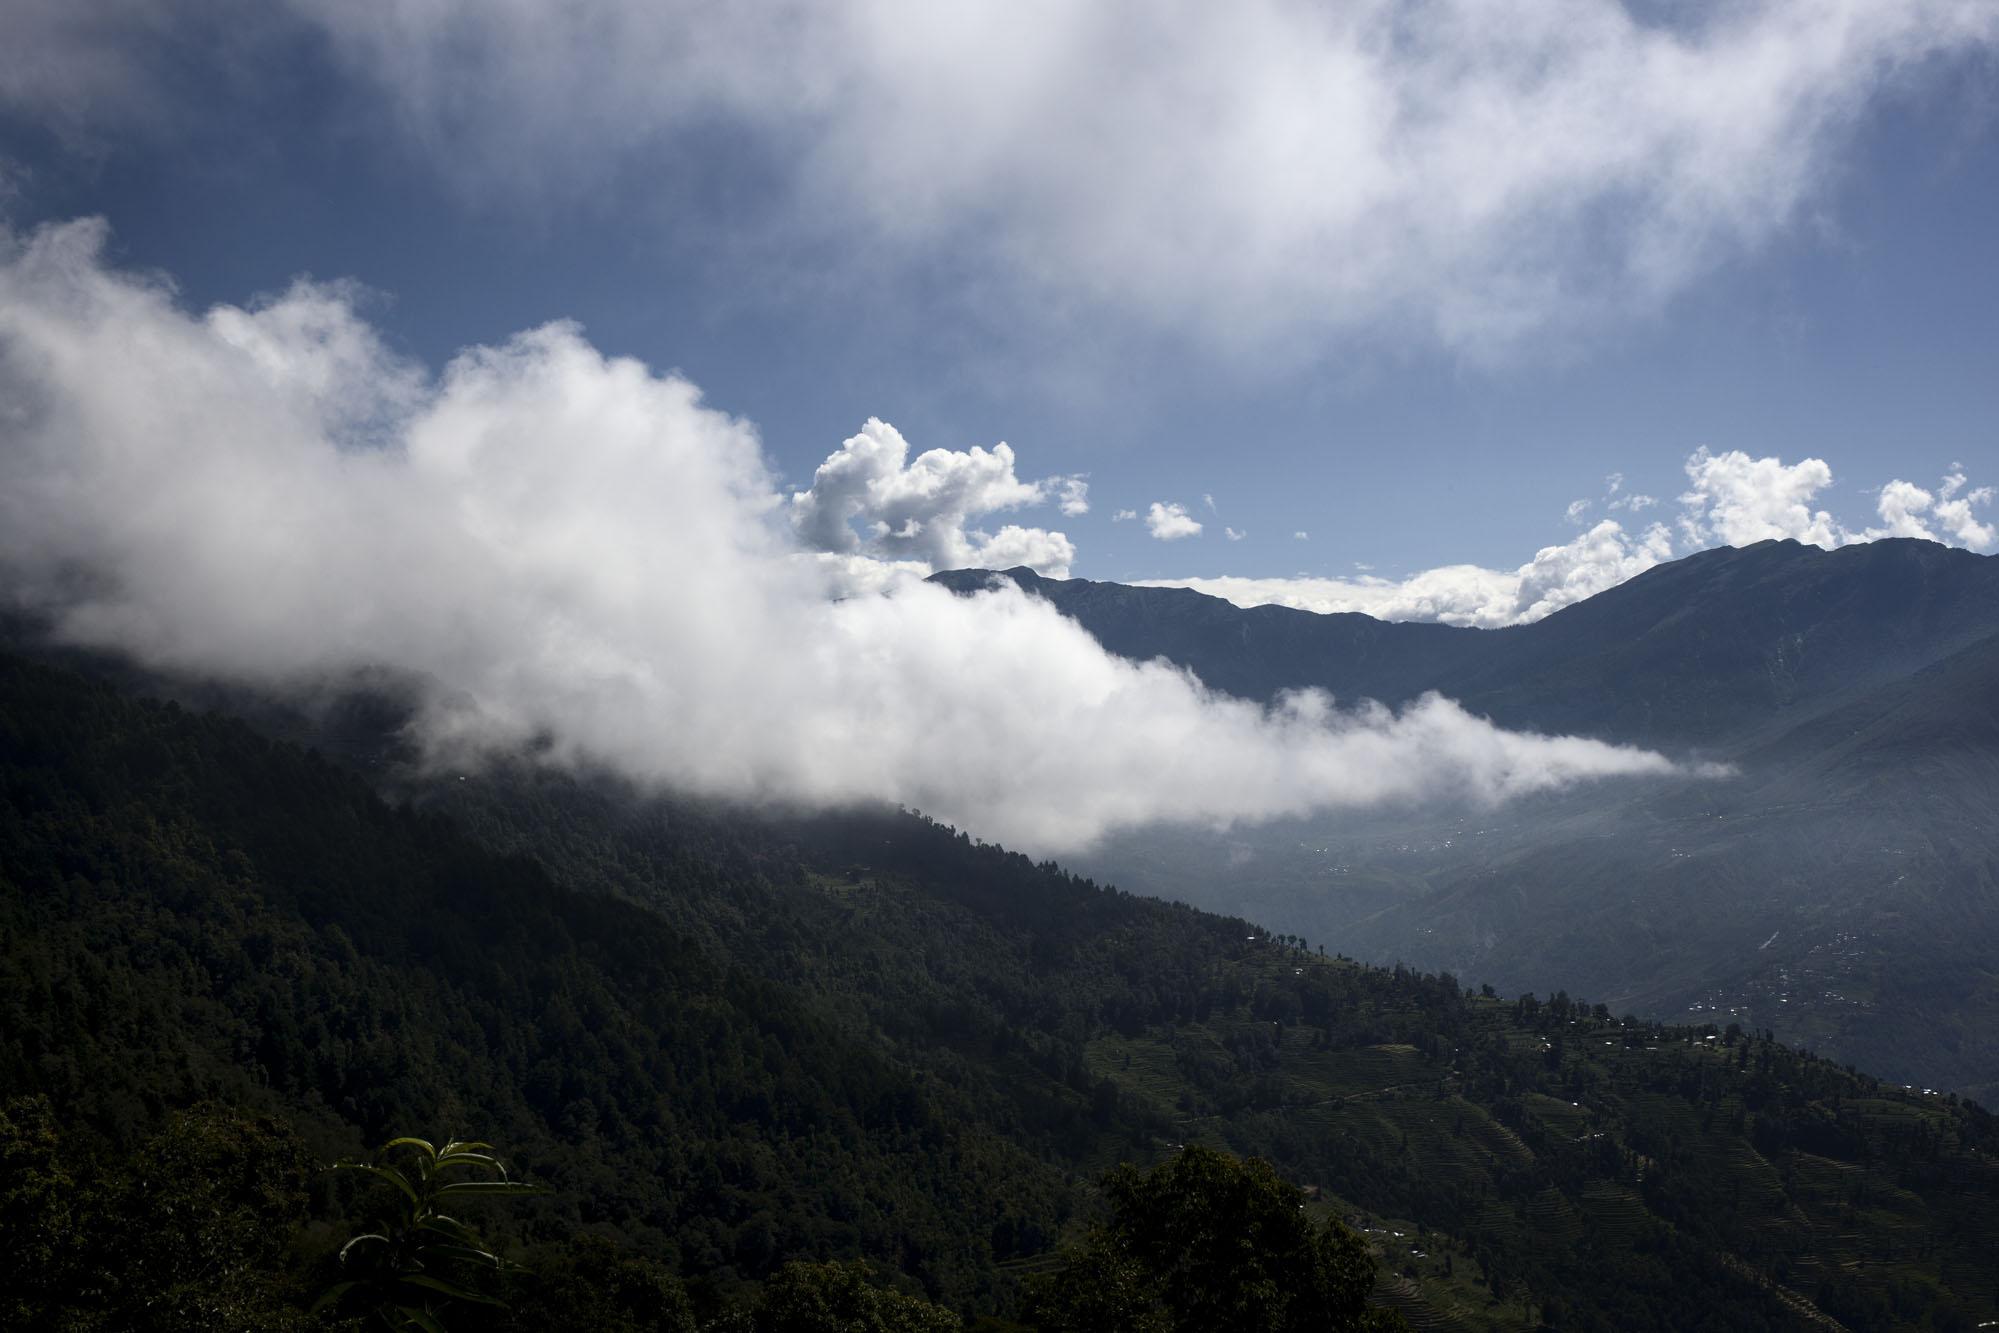 Overview Sindupalchowk District, Nepal. July 28, 2015